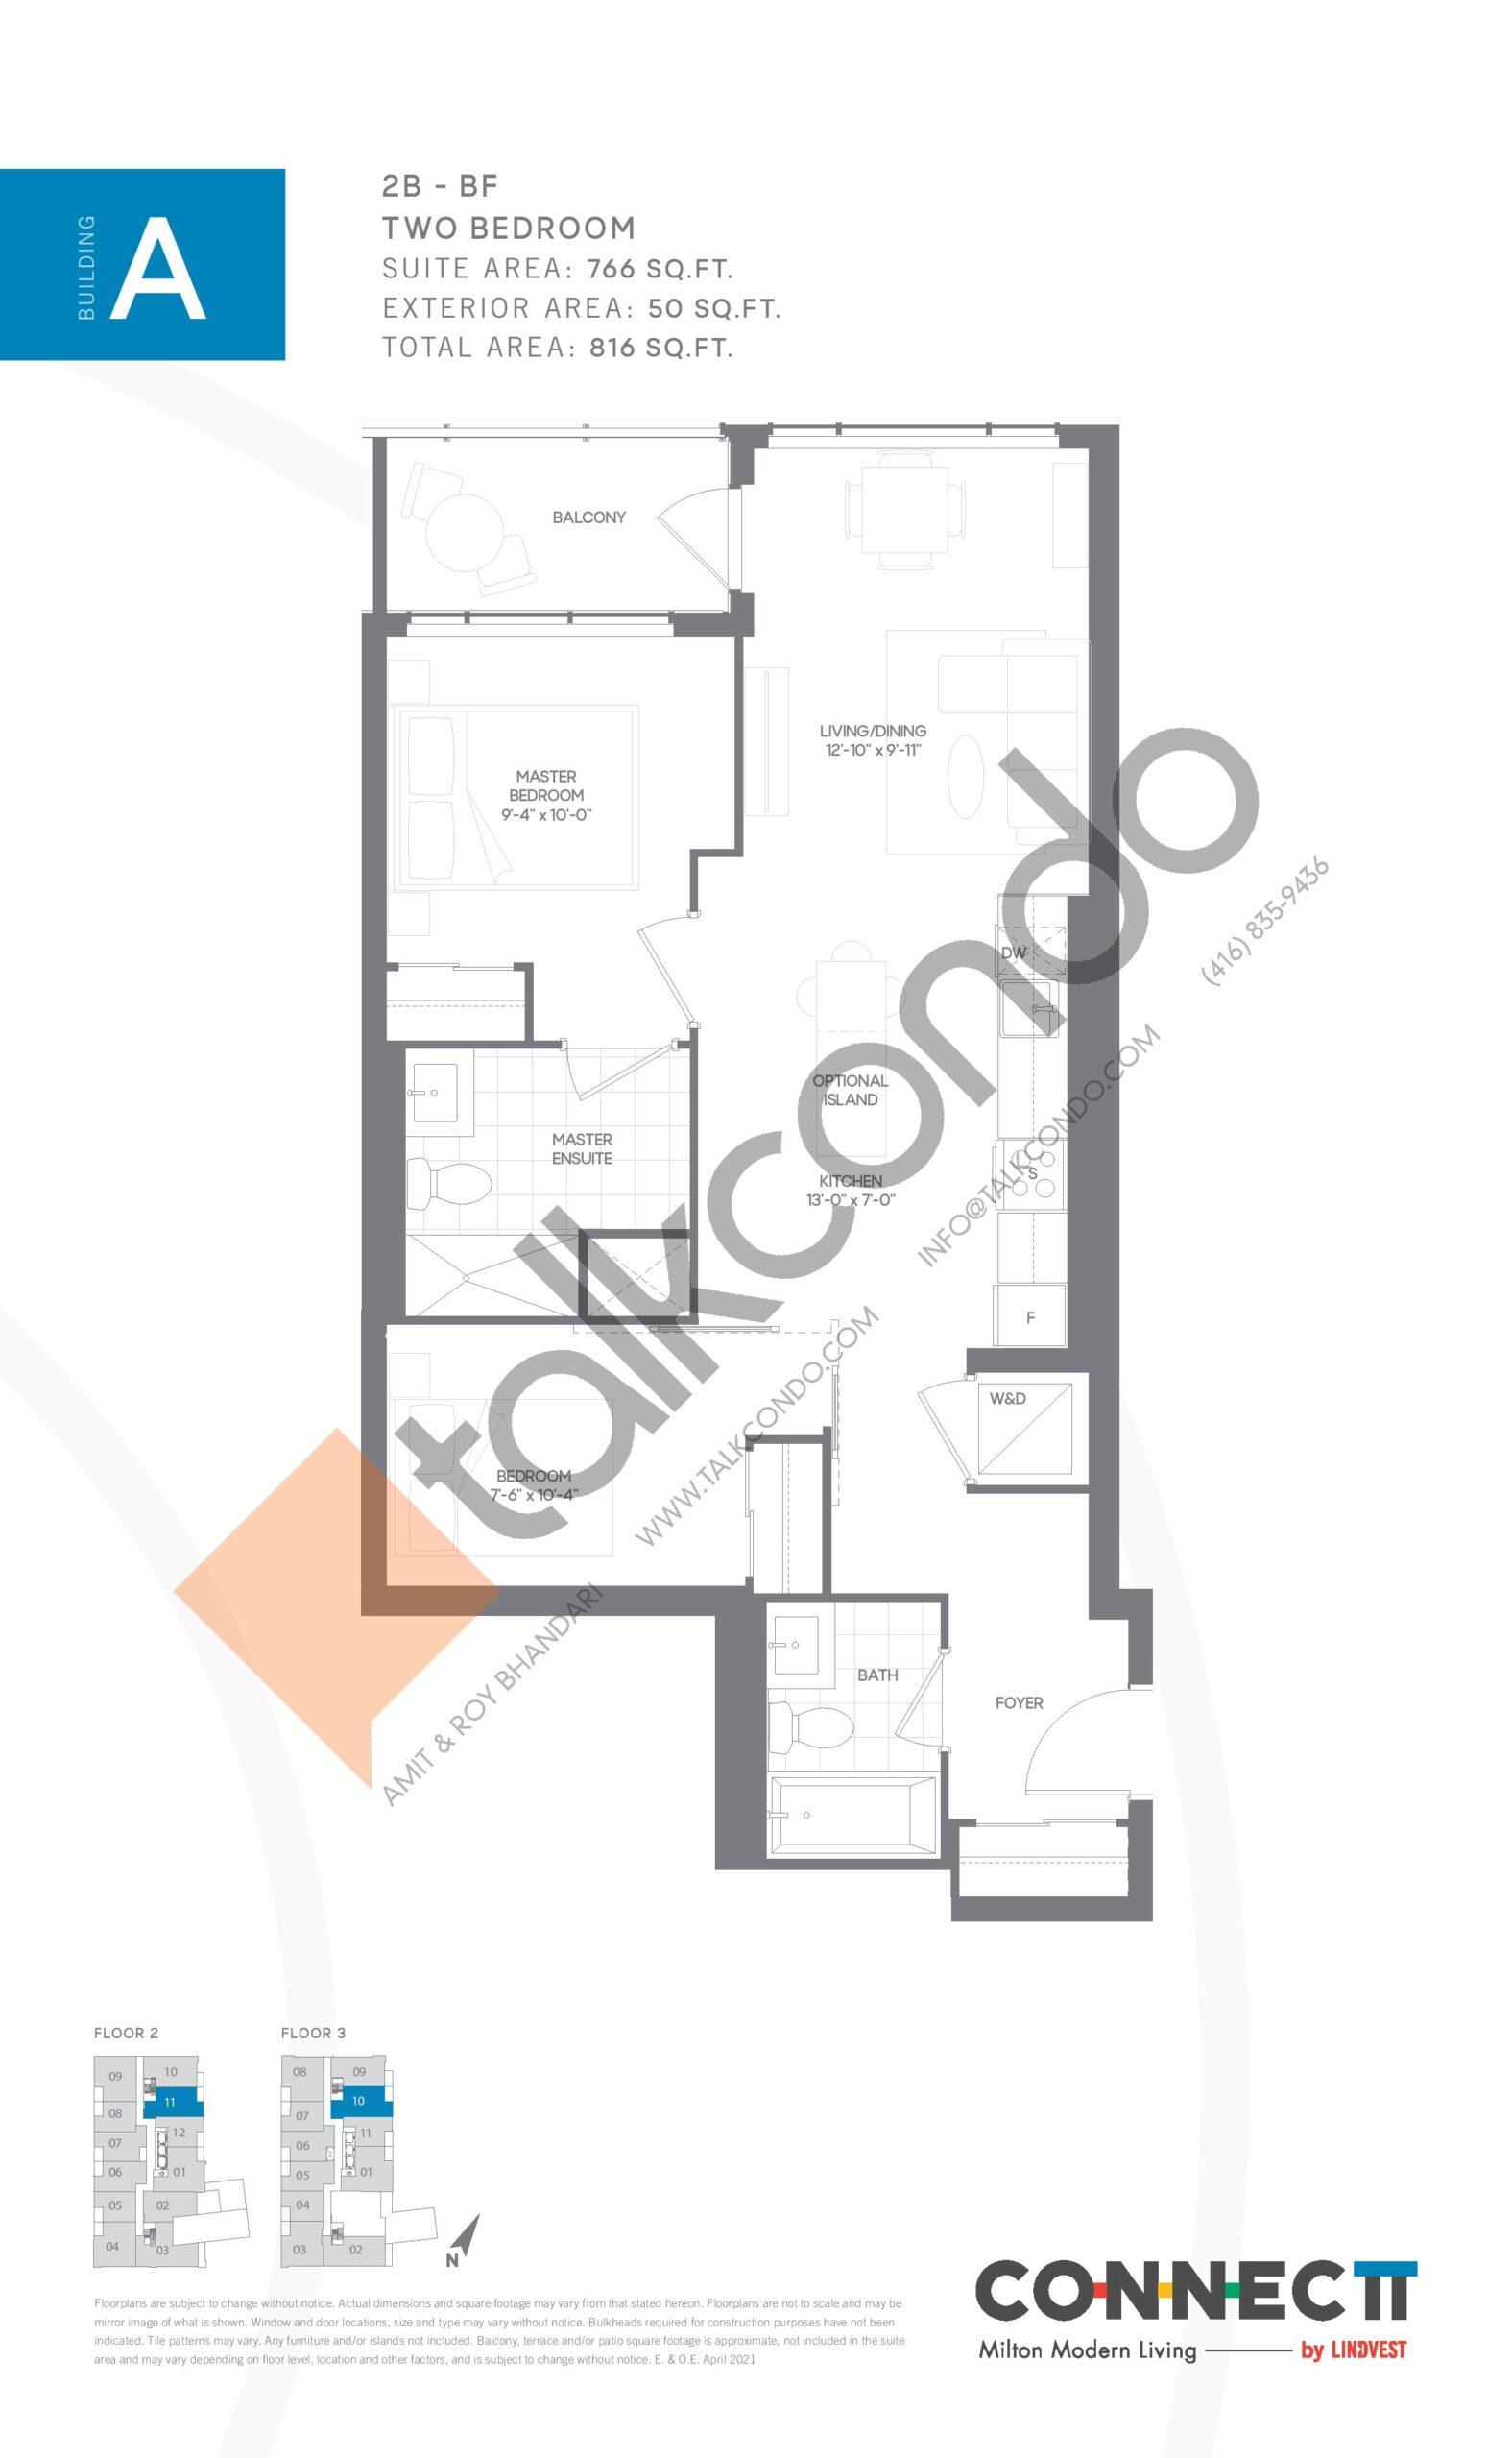 2B - BF Floor Plan at Connectt Urban Community Condos - 766 sq.ft